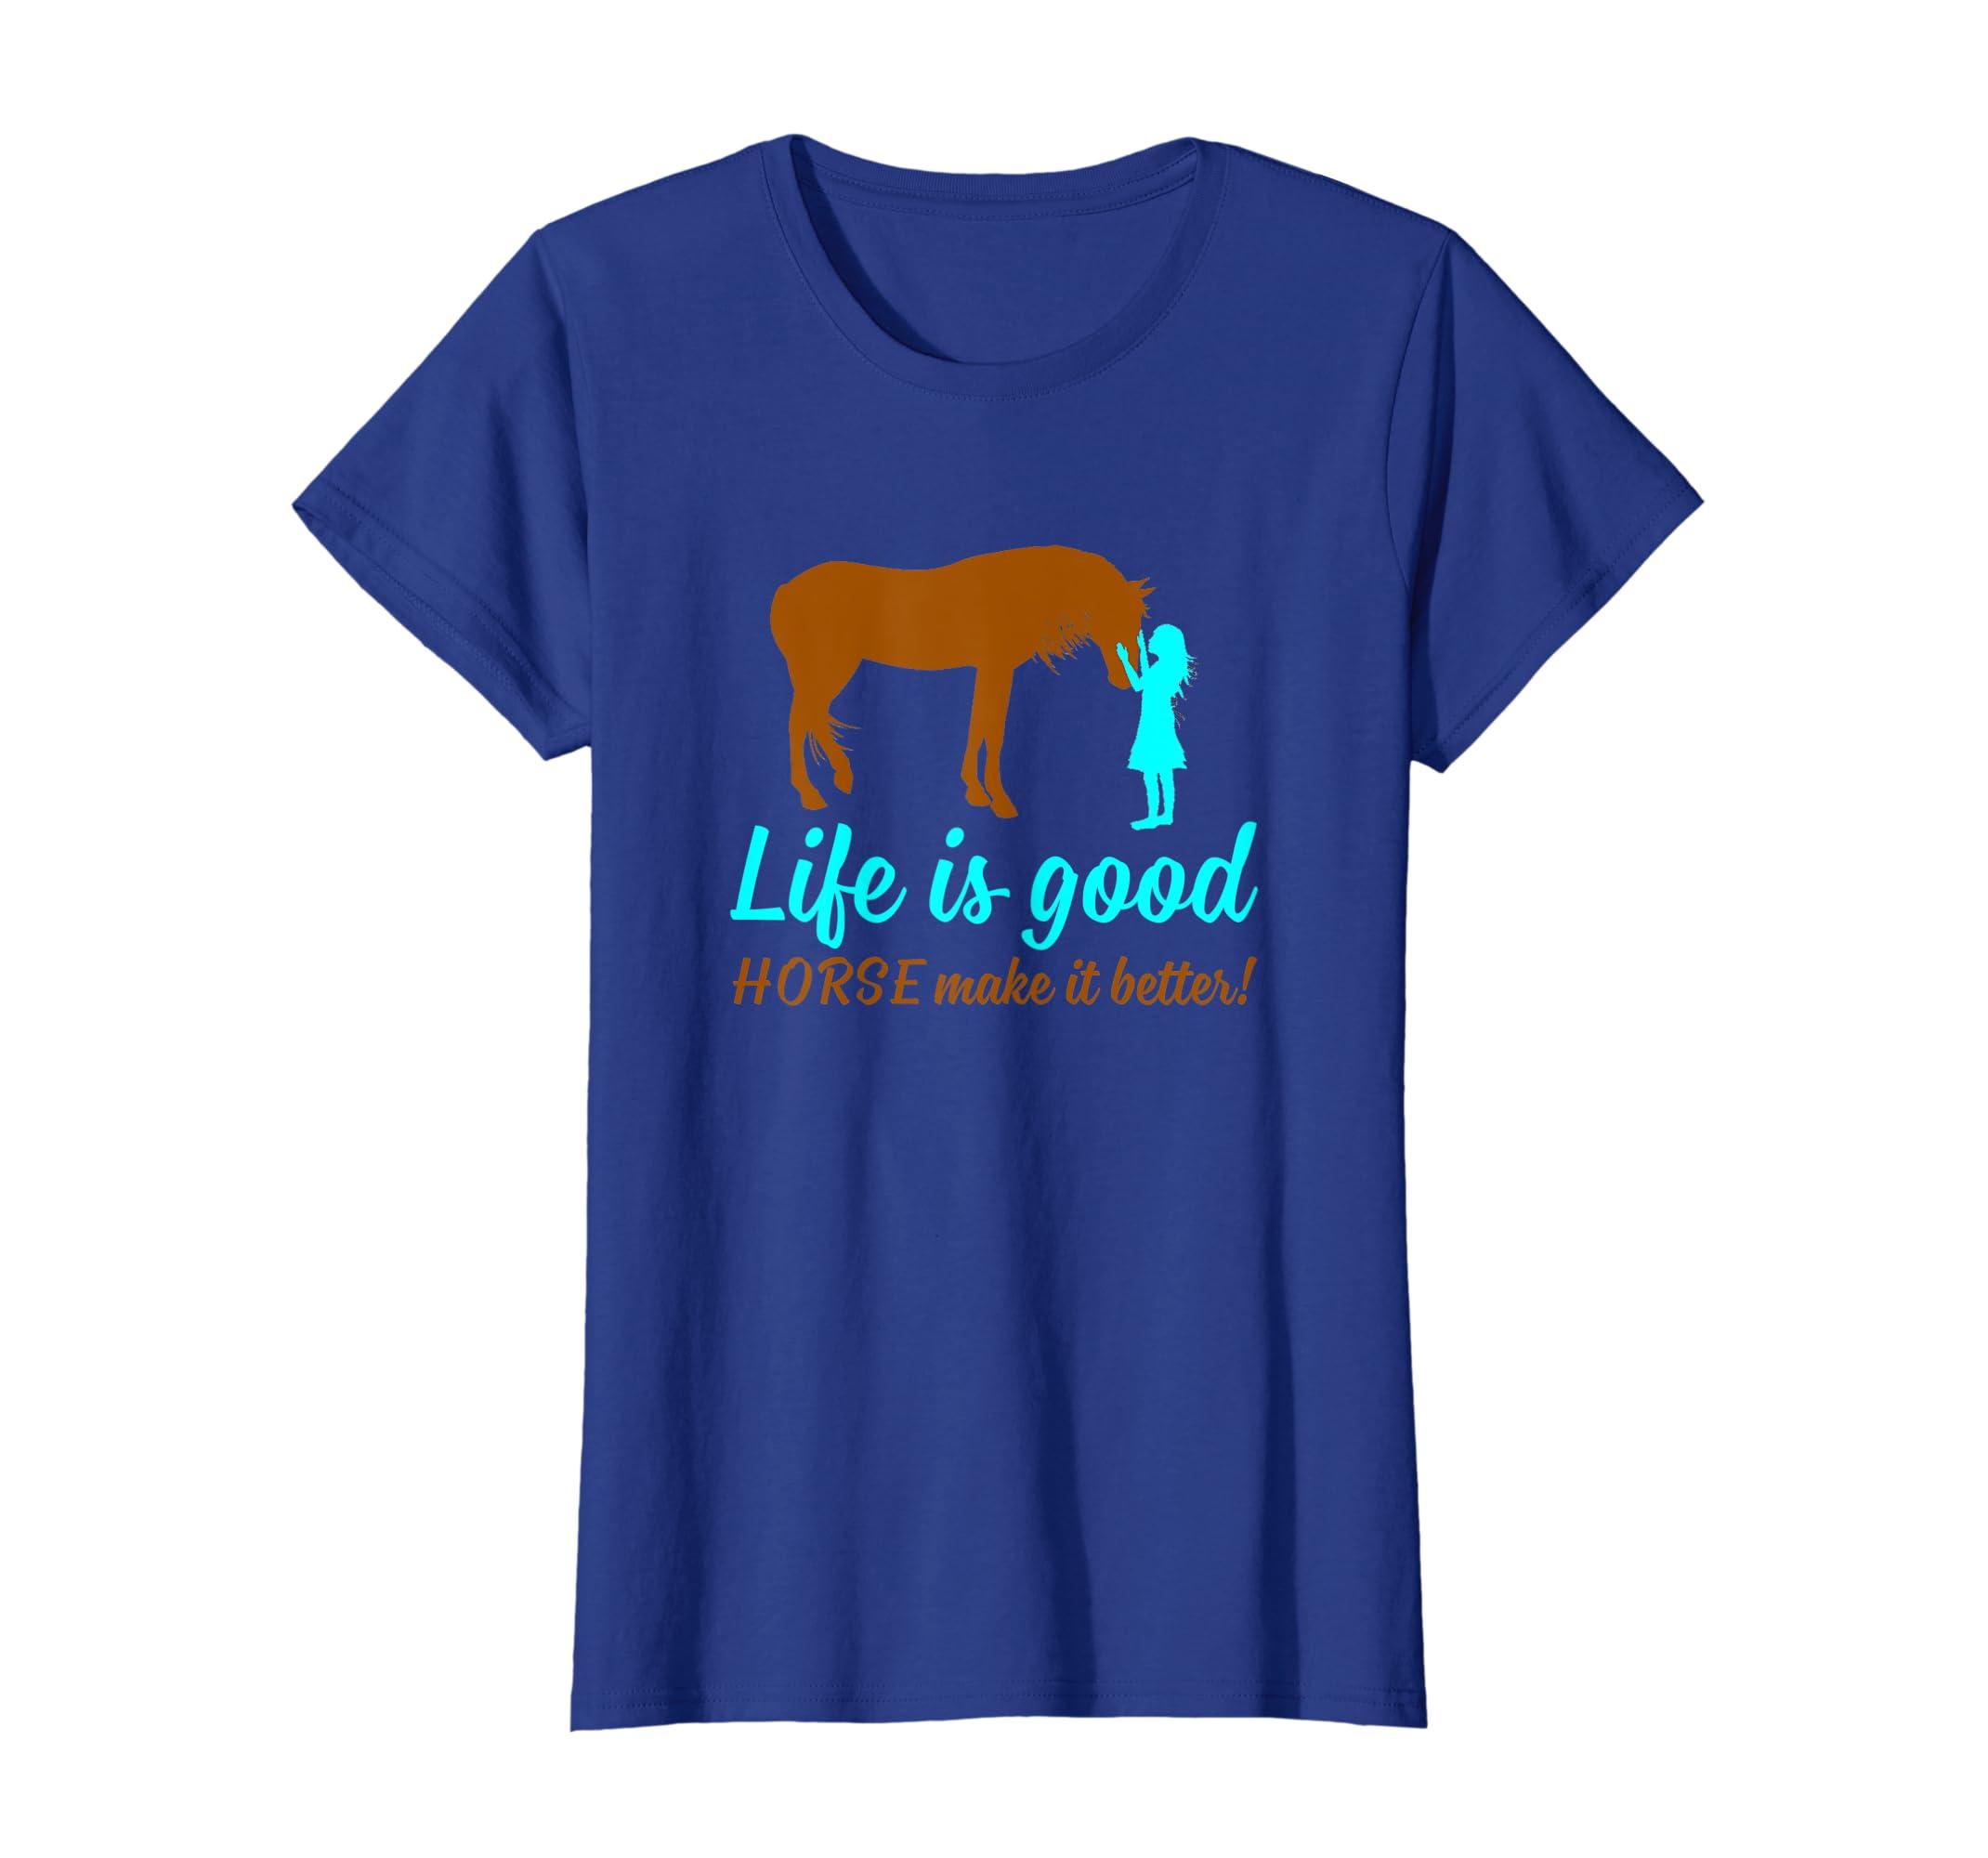 91b1615670a646 Amazon.com: LIFE IS GOOD HORSE MAKE IT BETTER T SHIRT: Clothing